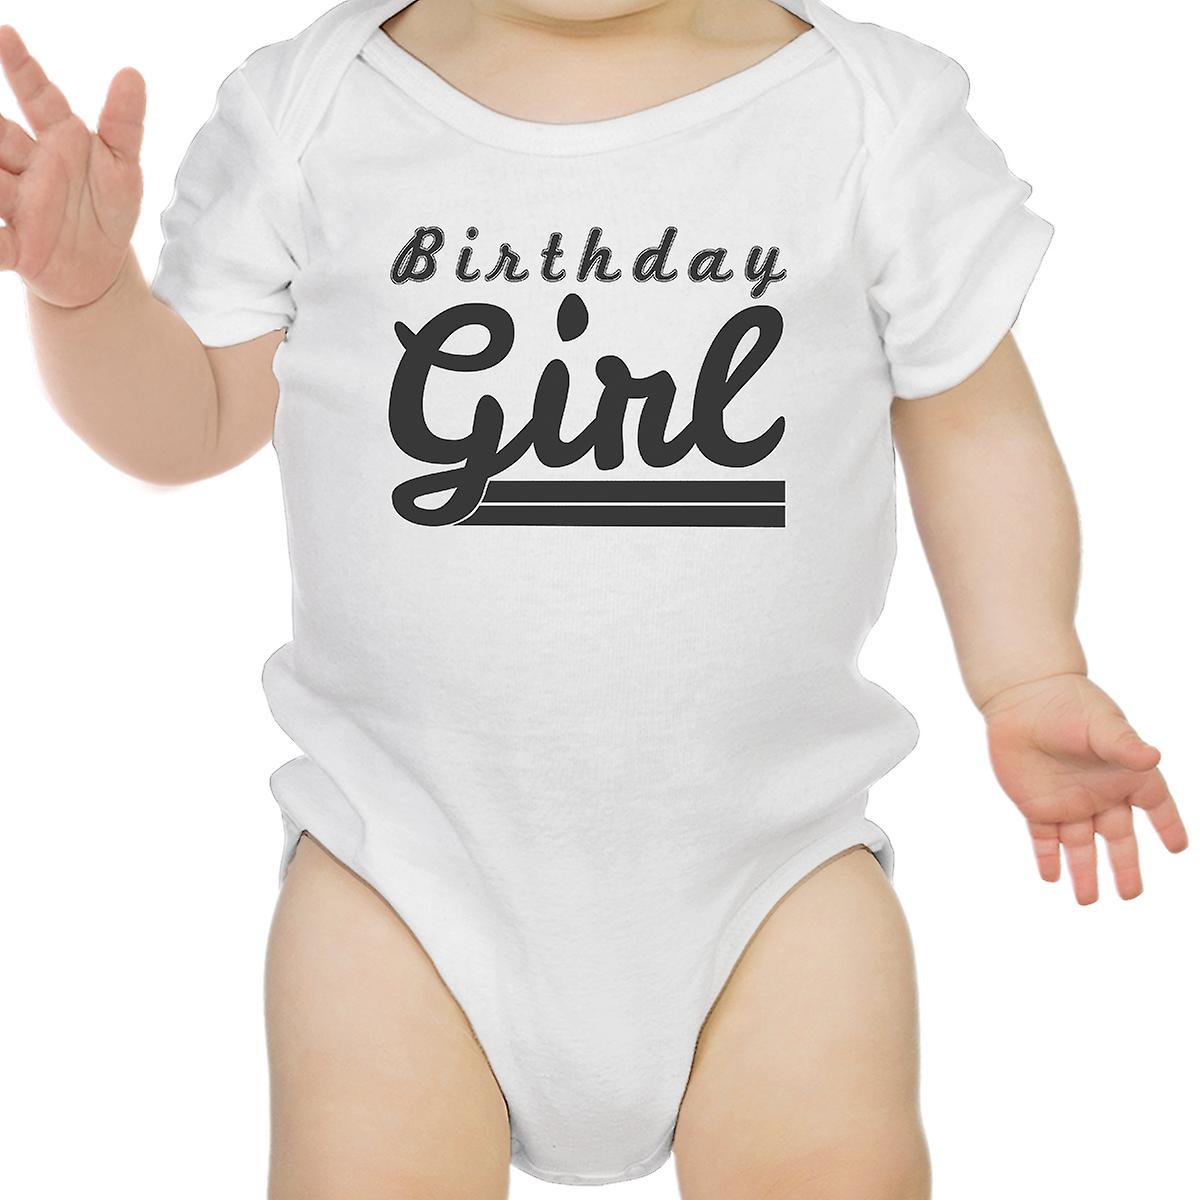 Birthday Girl White Bodysuit Cotton Cute 1st Baby Gift